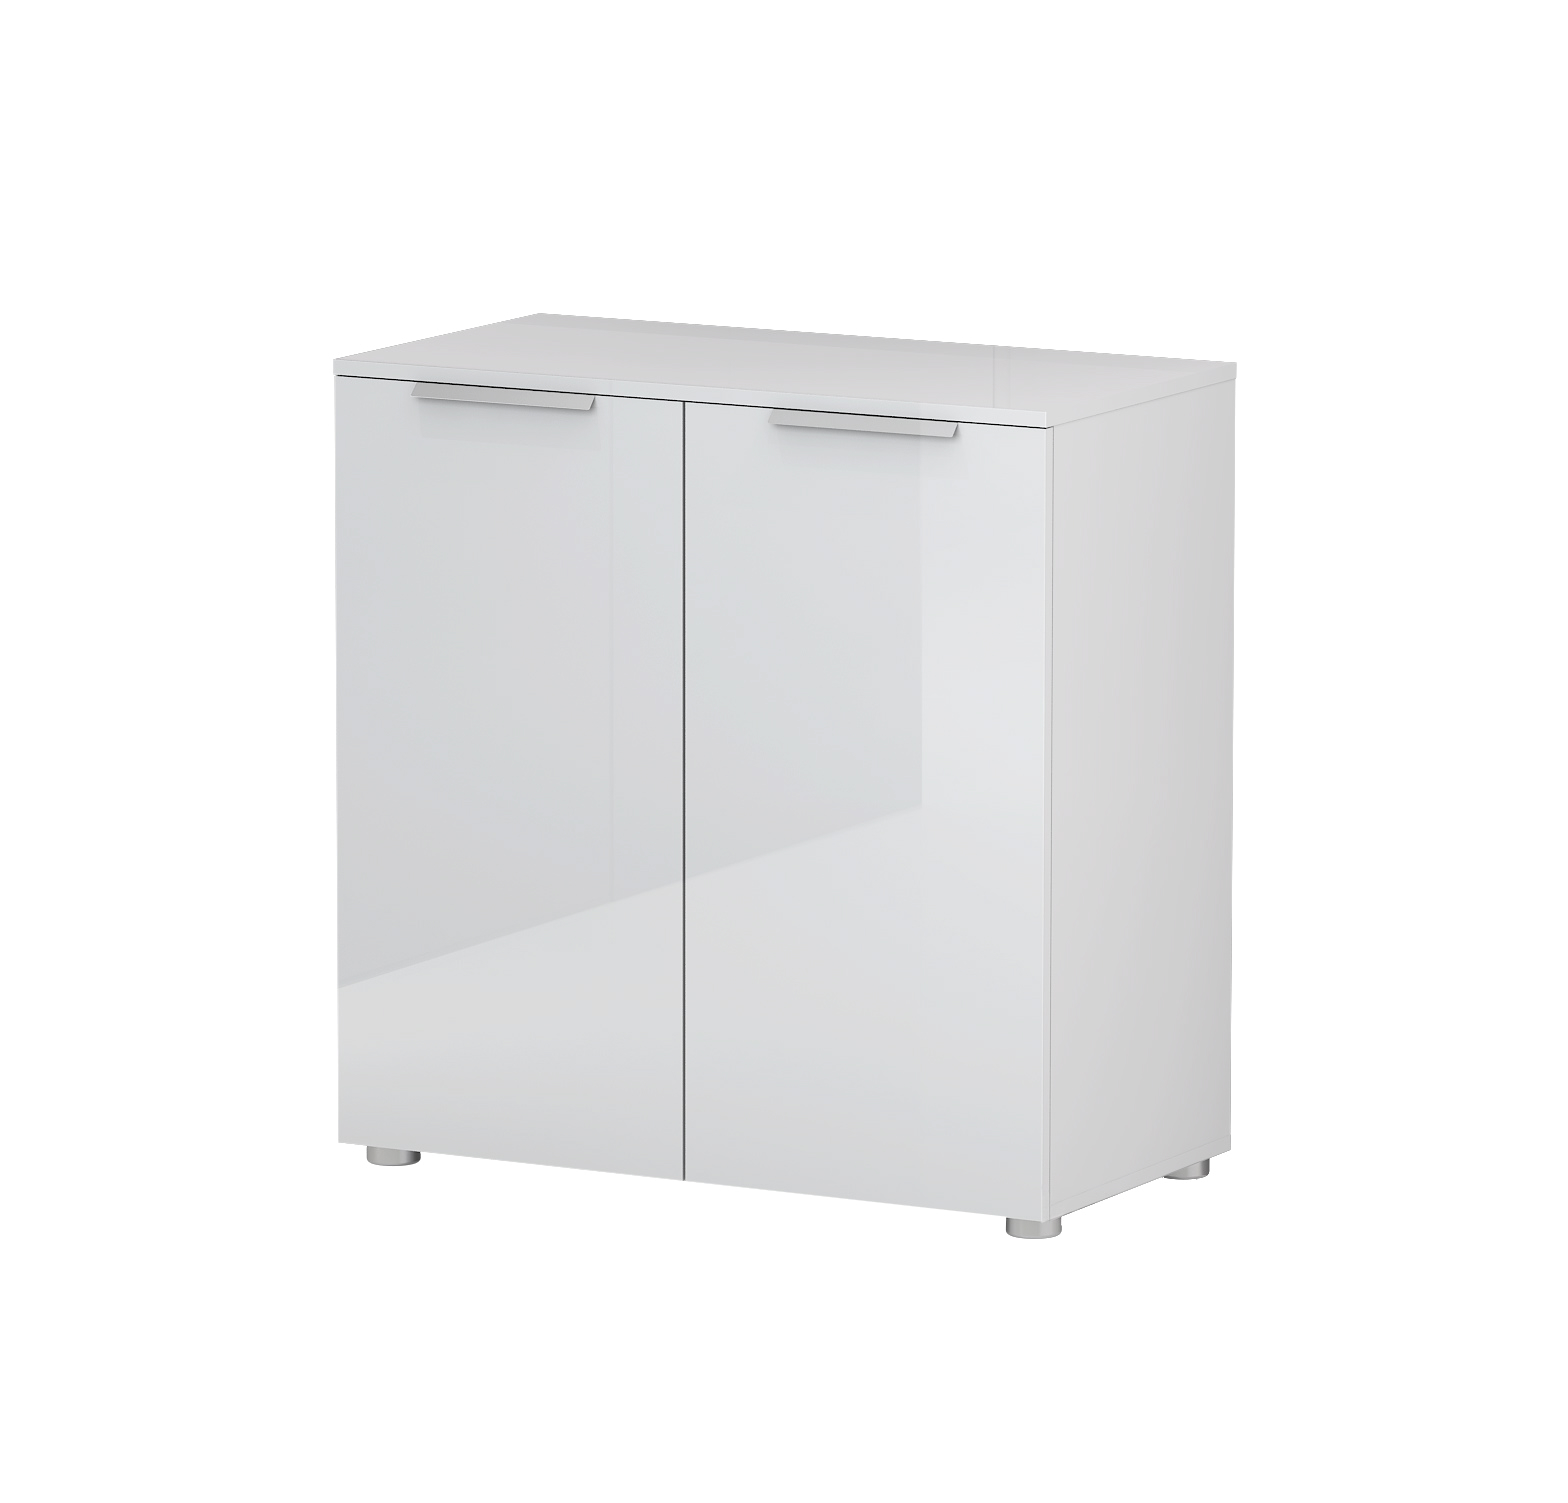 kommode bliss hochglanz wei schrank sideboard anrichte t ren schubladen neu ebay. Black Bedroom Furniture Sets. Home Design Ideas